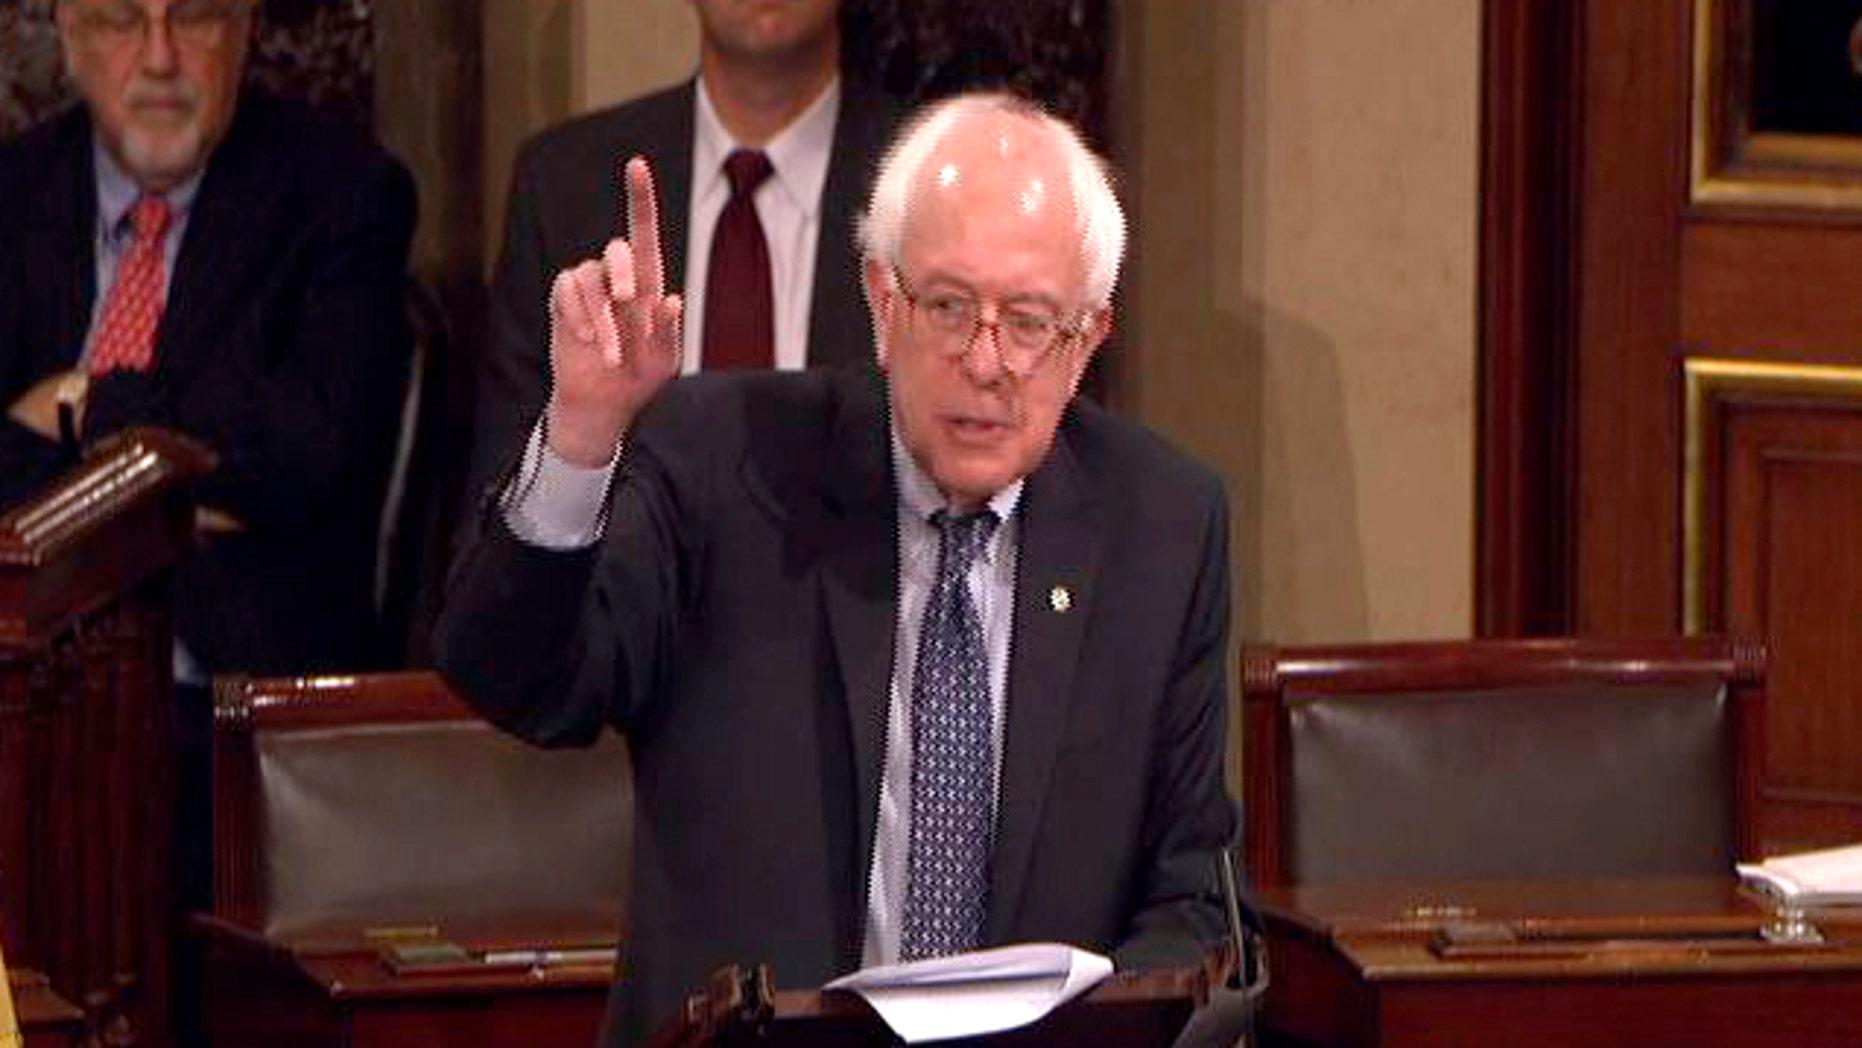 Dec. 10: This video shows Sen. Bernard Sanders, I-Vt., speaking on the floor of the Senate on Capitol Hill.